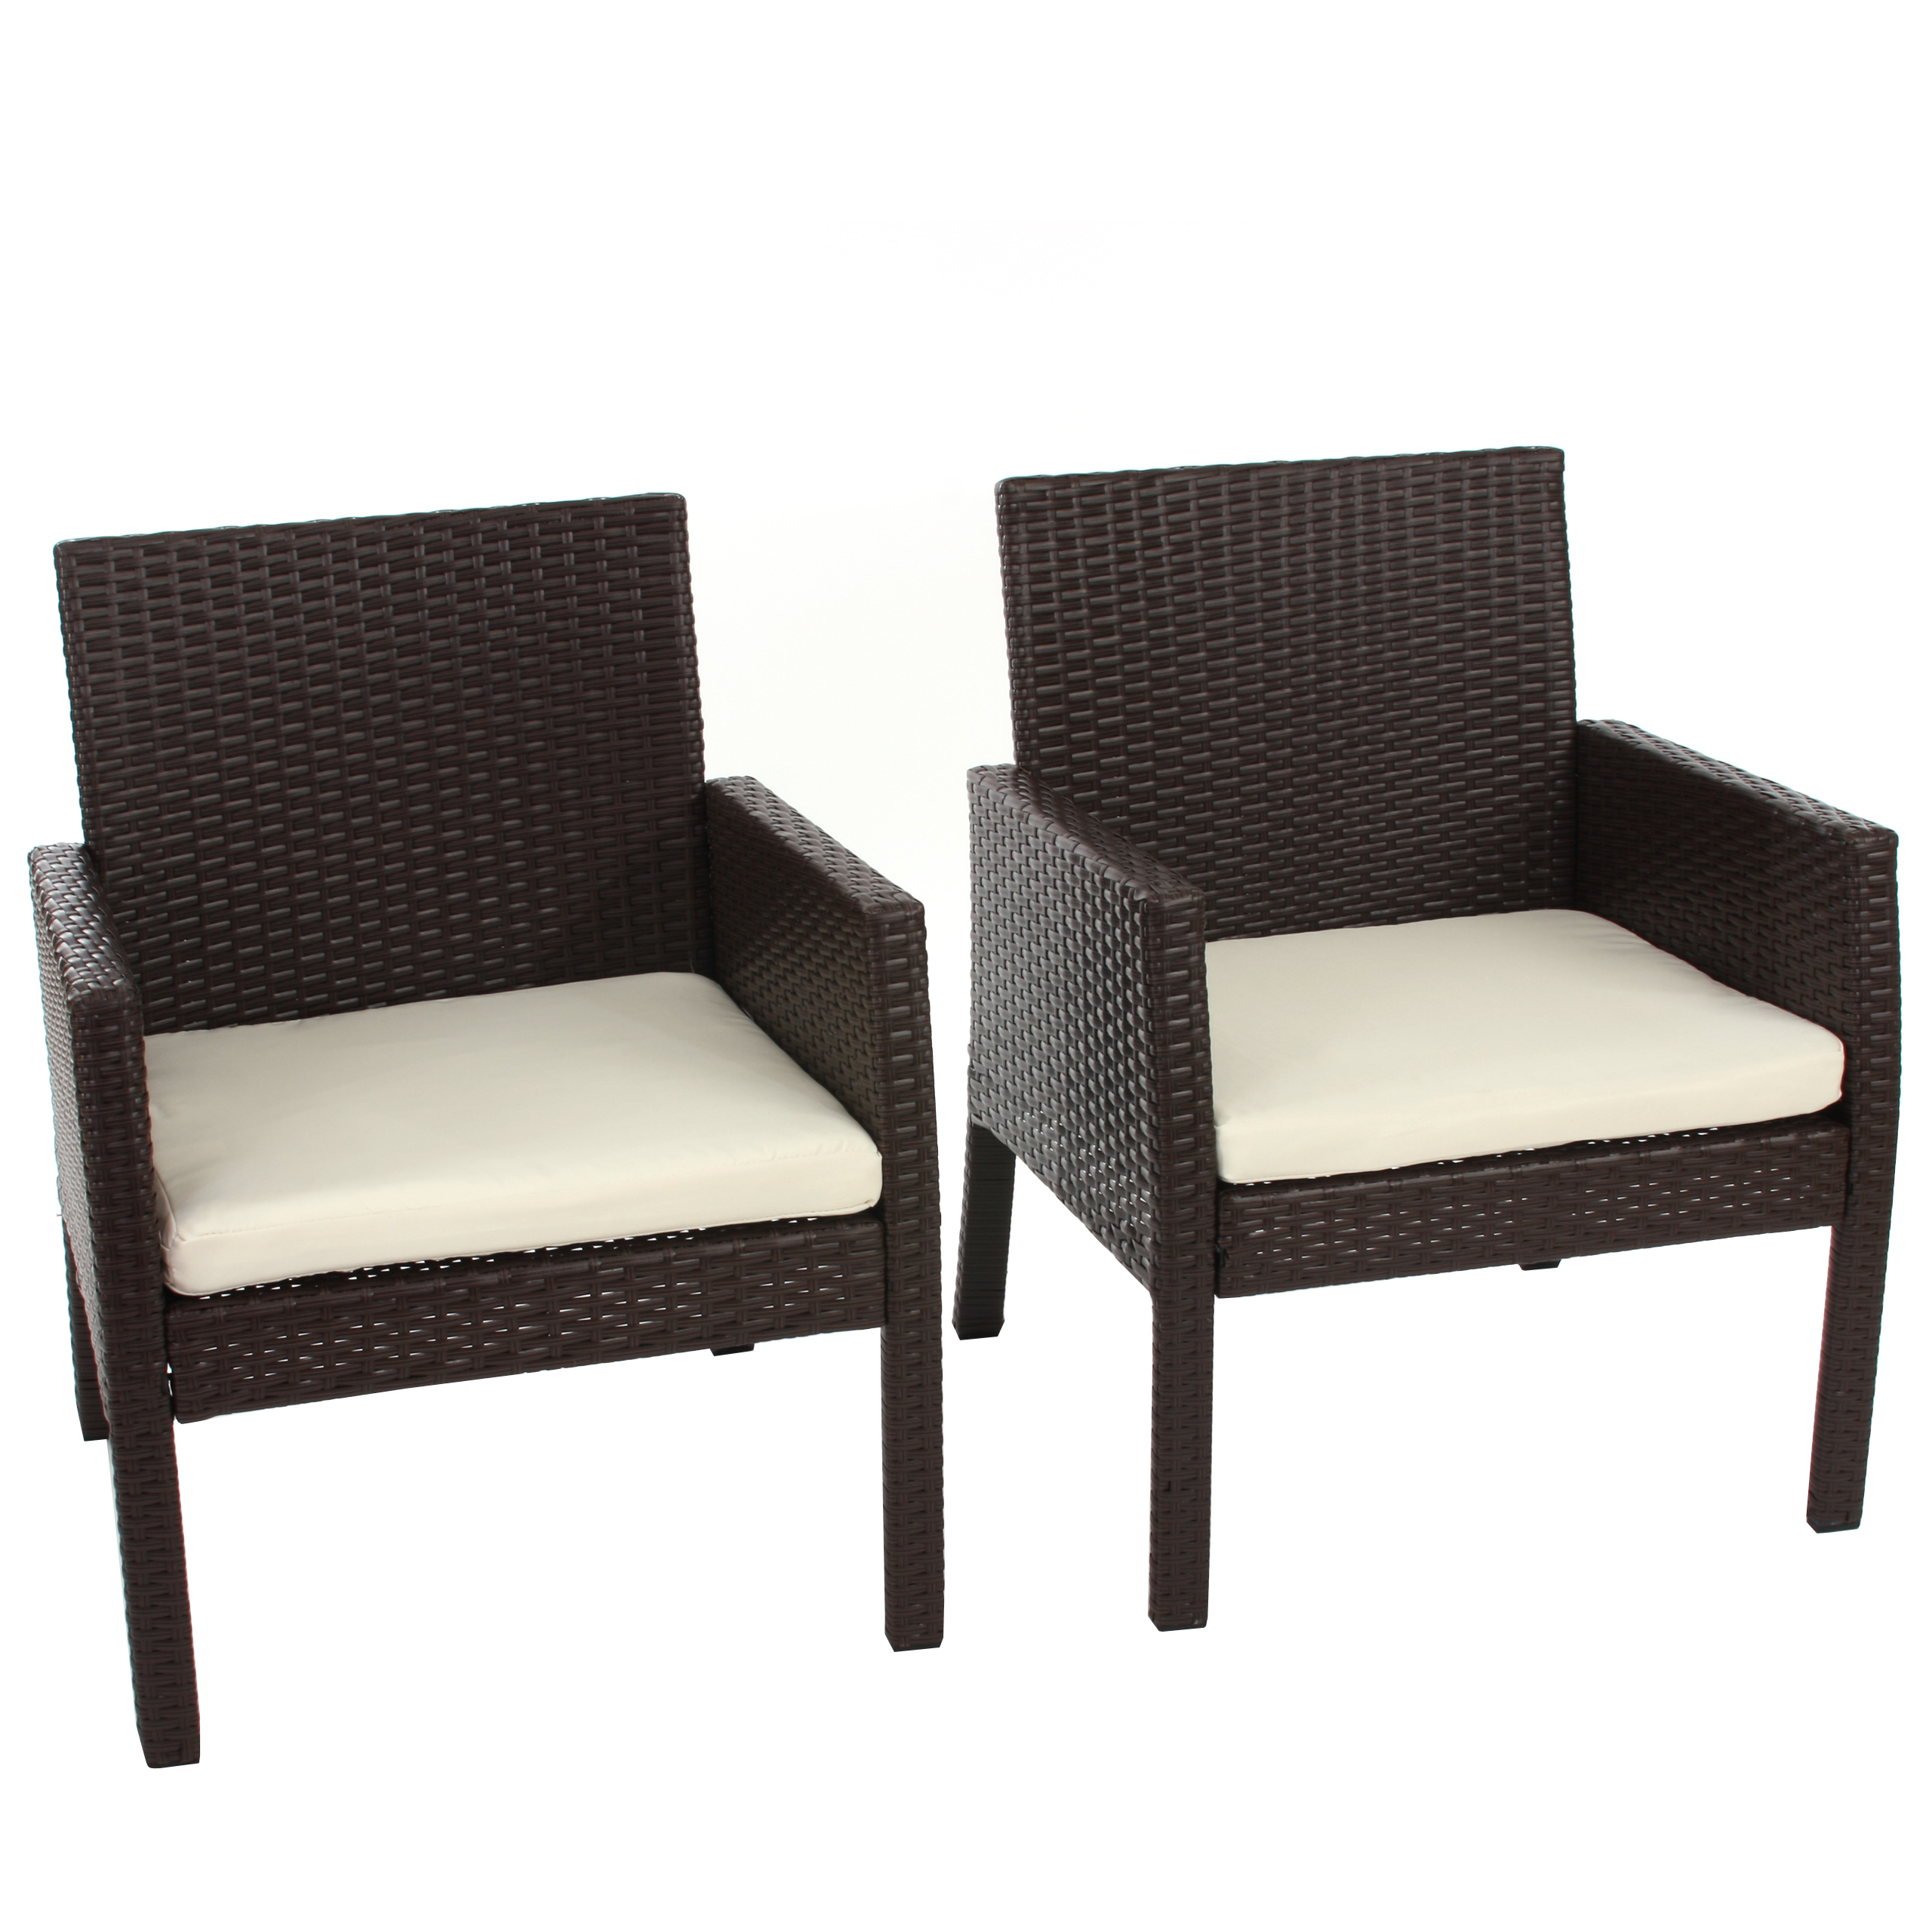 2x poly rattan sessel gartensessel sanremo inkl sitzkissen ebay. Black Bedroom Furniture Sets. Home Design Ideas